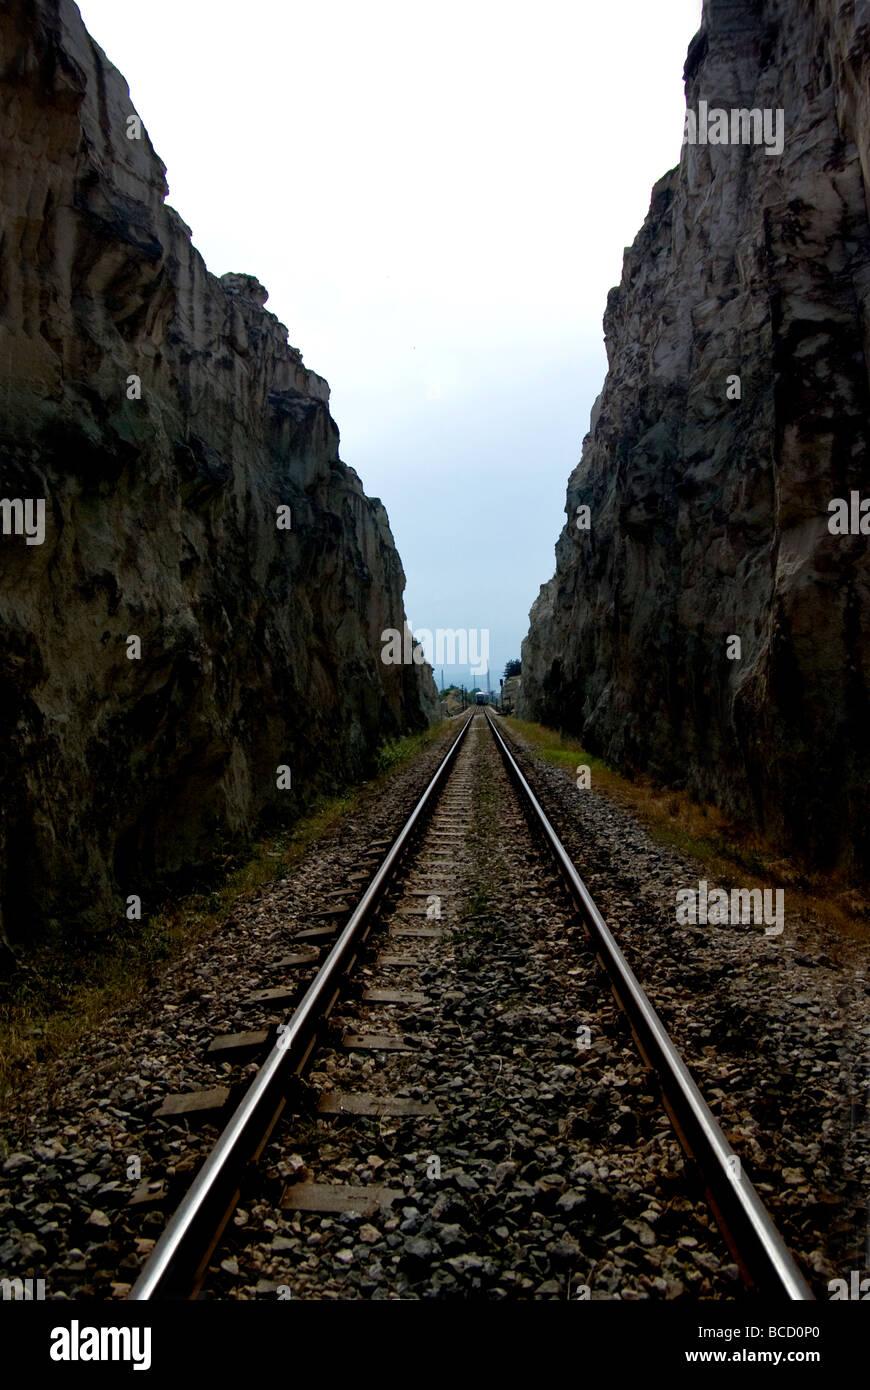 rails - Stock Image